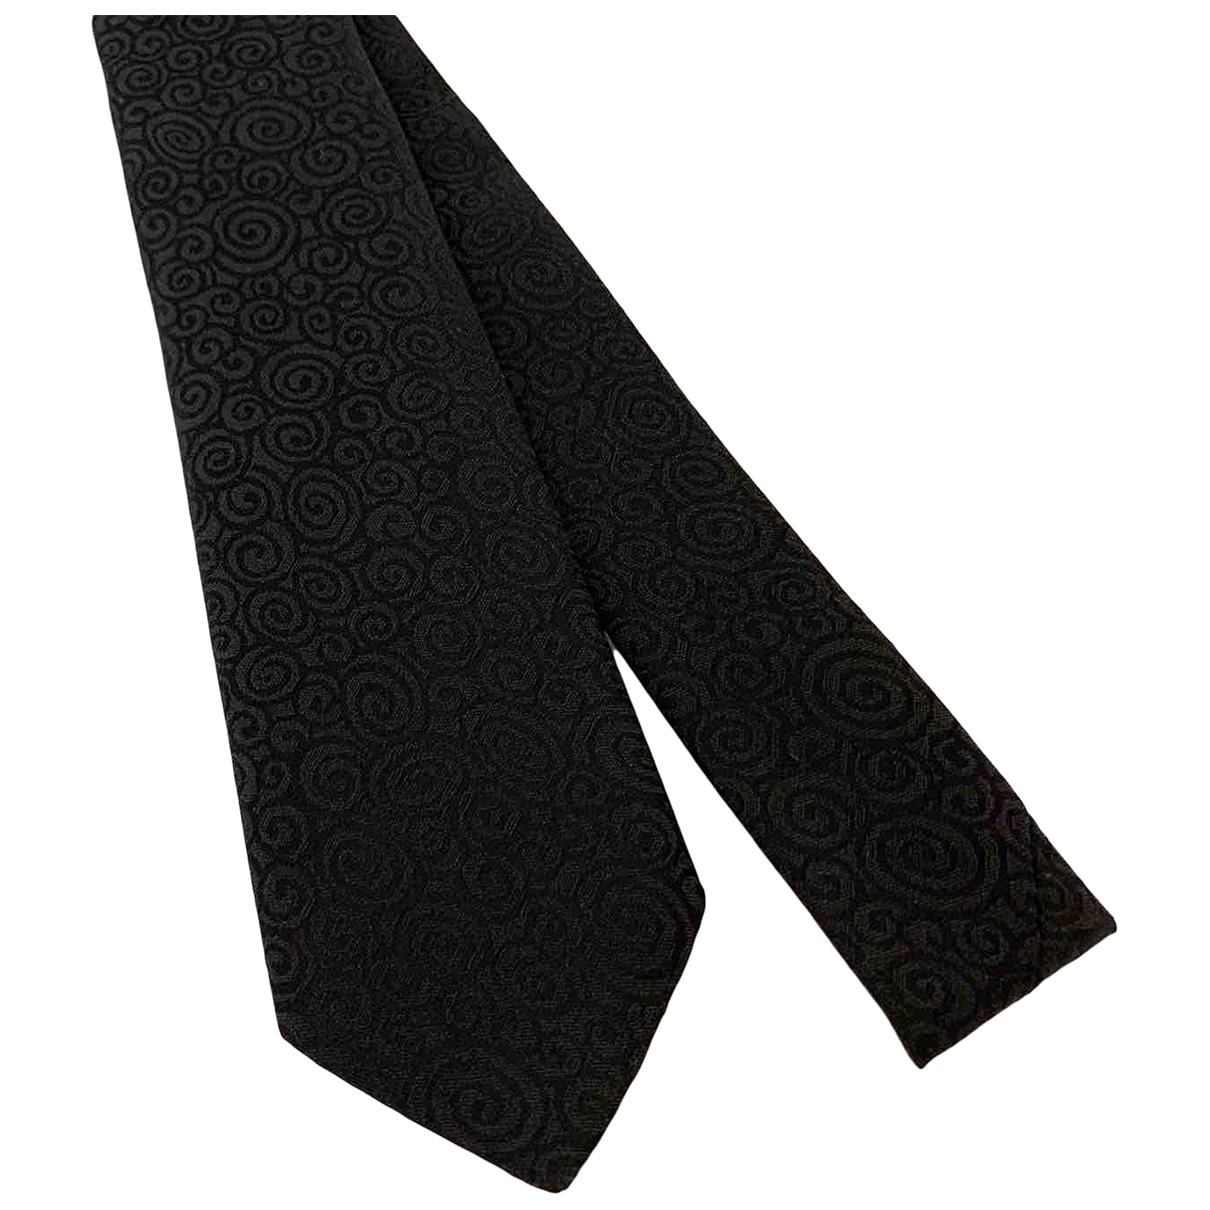 Dolce & Gabbana \N Krawatten in  Schwarz Baumwolle